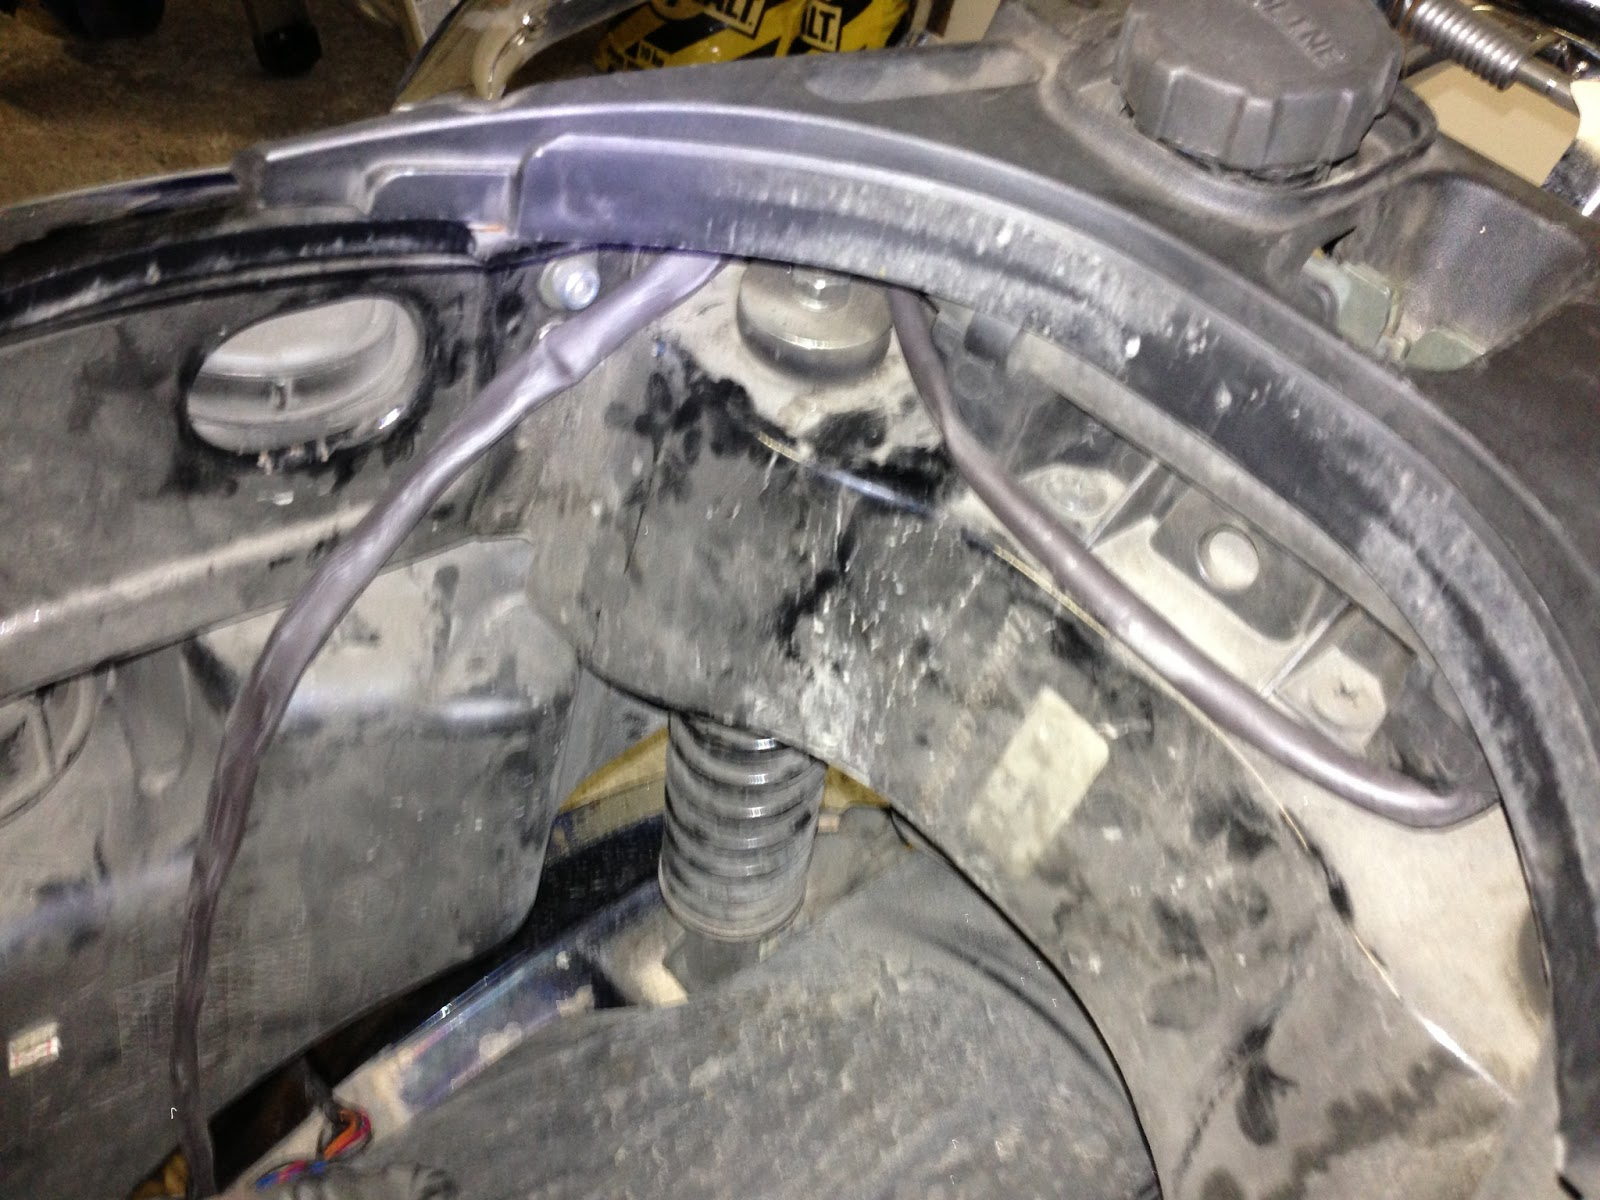 A5EAB Vespa Lx 150 Wiring Diagram   Wiring Resources on vespa gtv 250 wiring diagram, vespa px 125 wiring diagram, vespa lx 150 engine, vespa lx 150 owner's manual, vespa lx 150 seats, vespa p200 parts diagram, vespa sprint wiring diagram, vespa lx 150 parts, vespa lx 150 oil type, vespa rally 200 wiring diagram, vespa et2 wiring diagram,